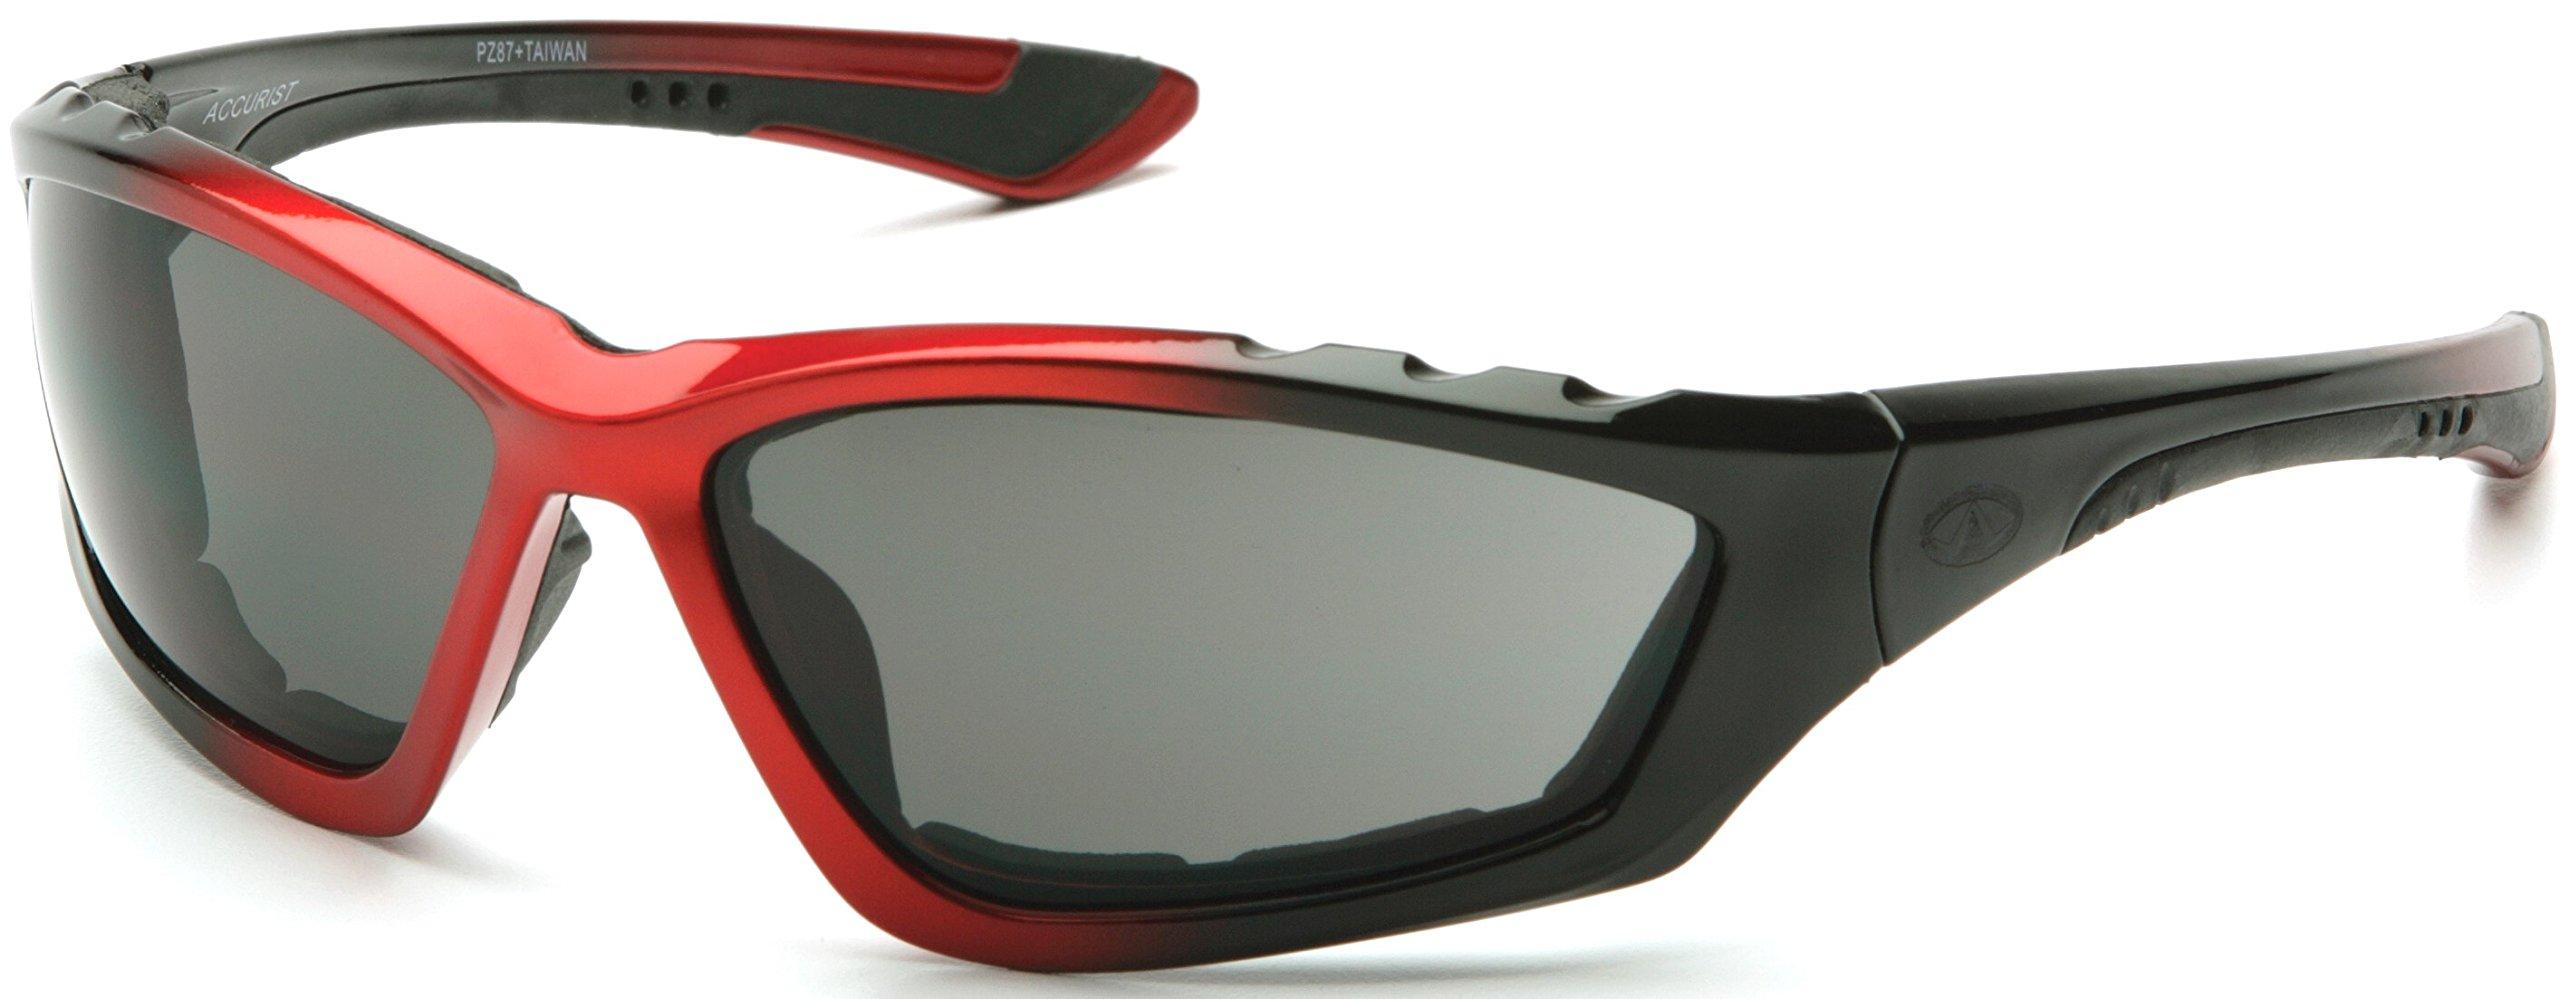 Pyramex Accurist Safety Glasses